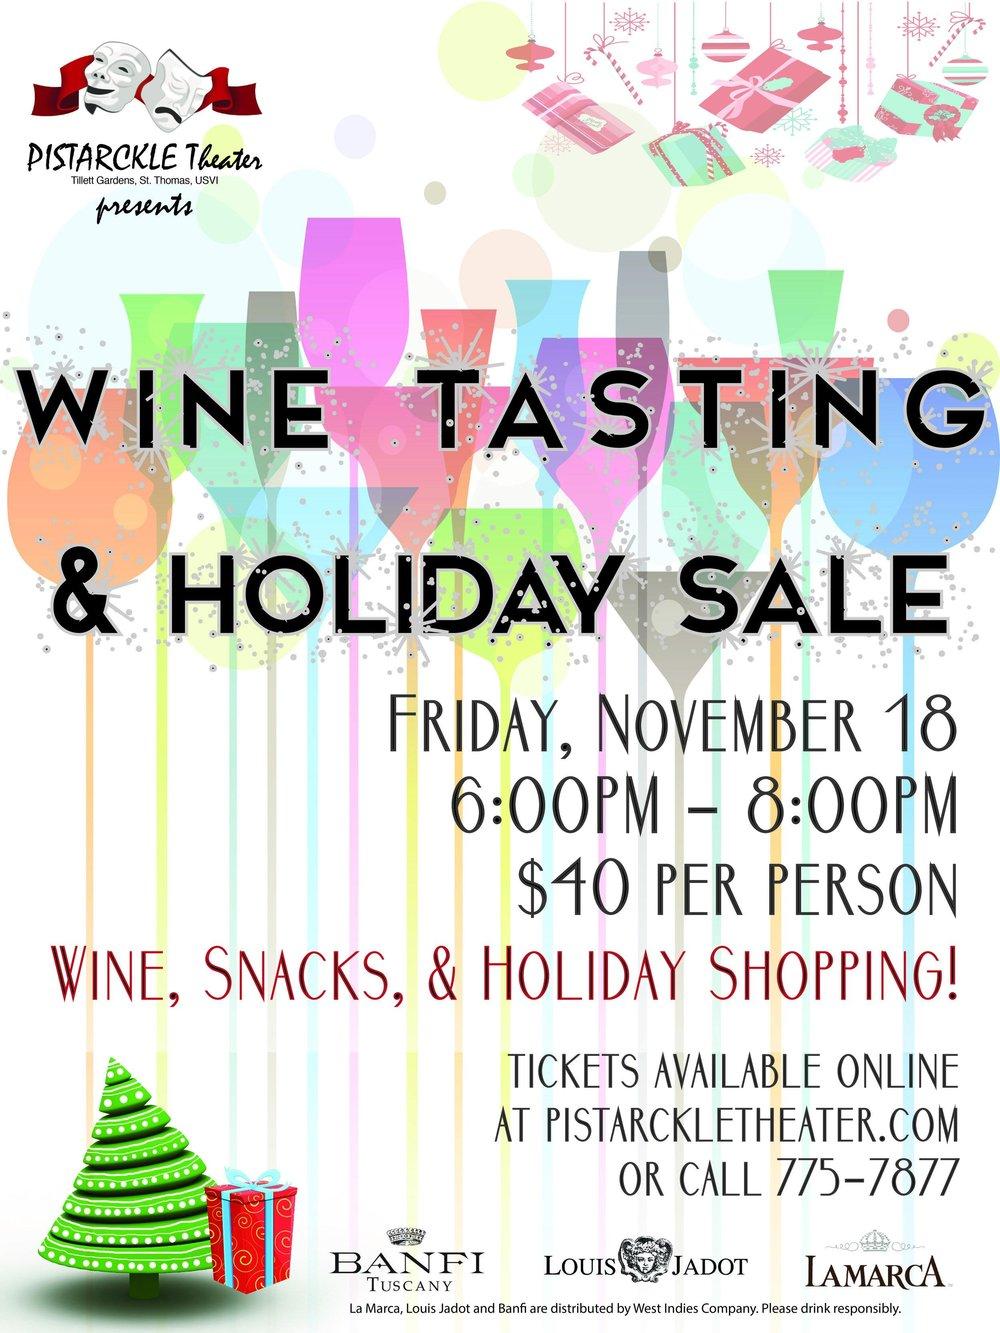 Wine Tasting at Pistarckle Theater - Live Entertainment on St. Thomas, USVI